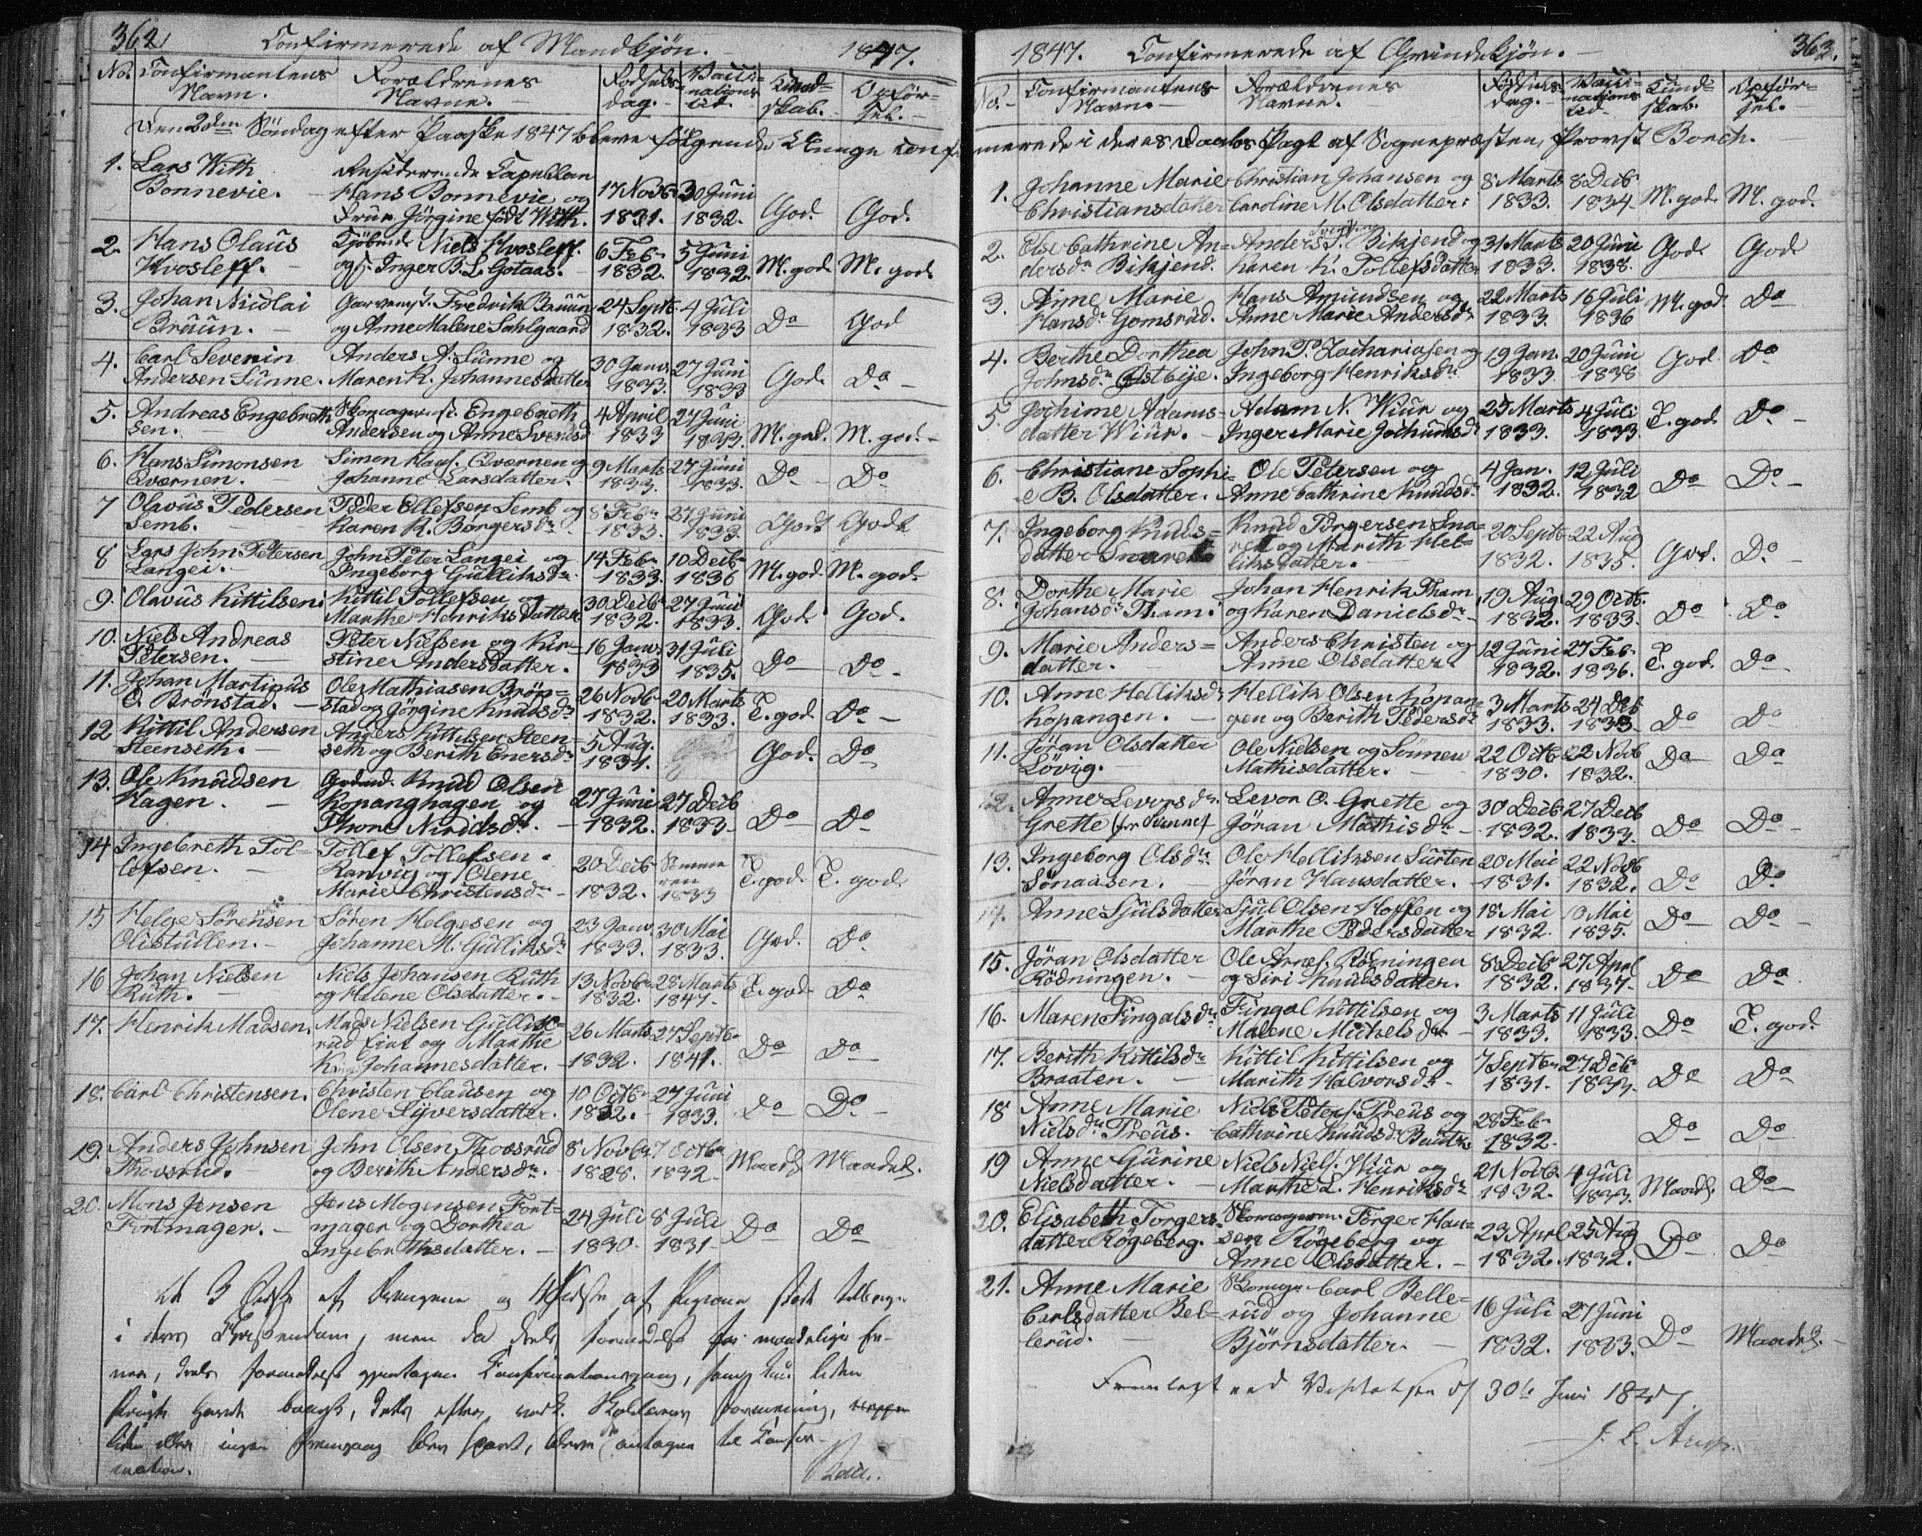 SAKO, Kongsberg kirkebøker, F/Fa/L0009: Parish register (official) no. I 9, 1839-1858, p. 362-363